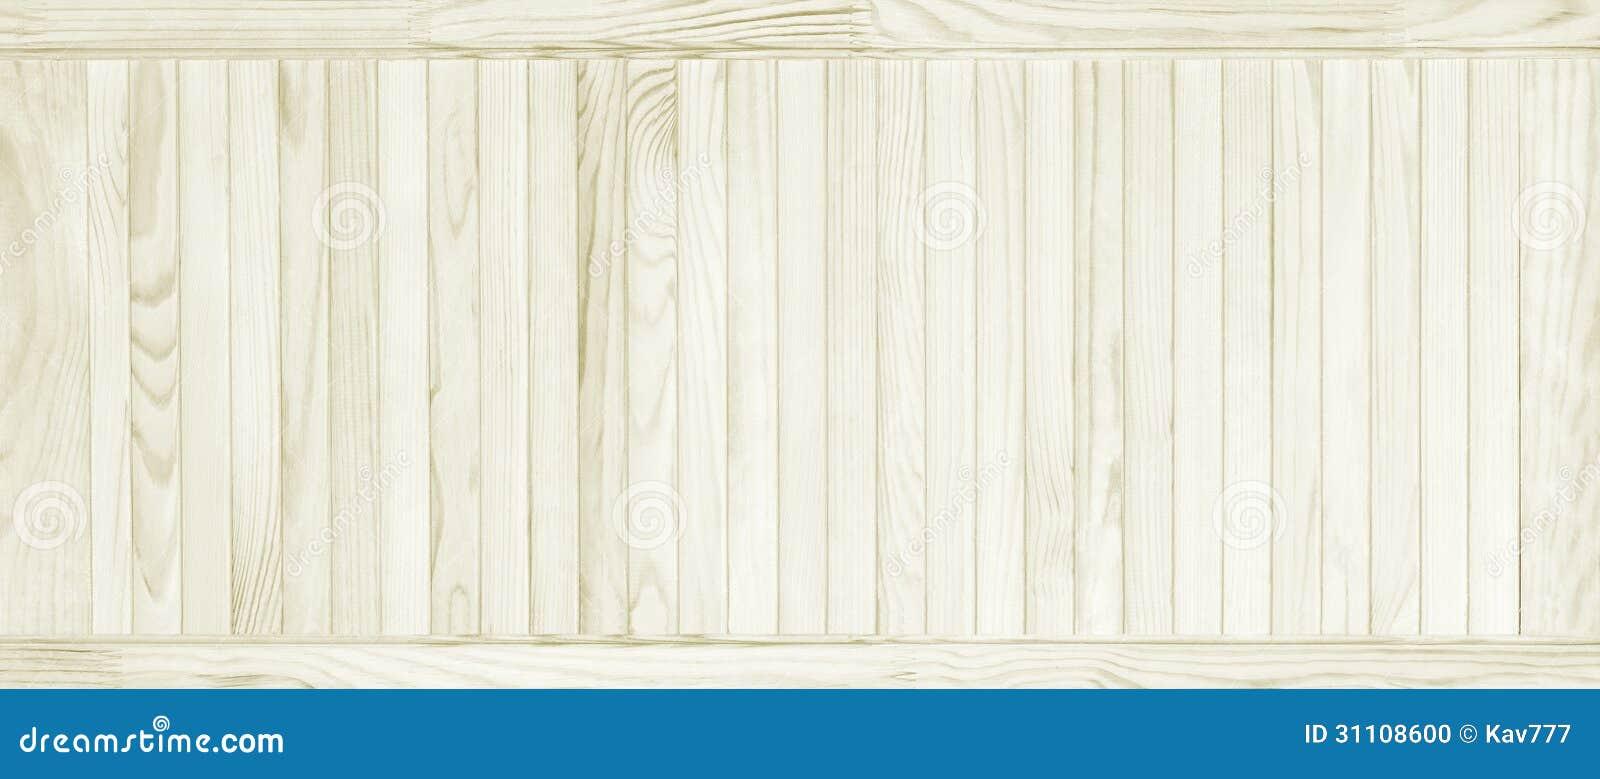 Textura blanca del tabl n de madera del pino foto de - Maderas del pino ...